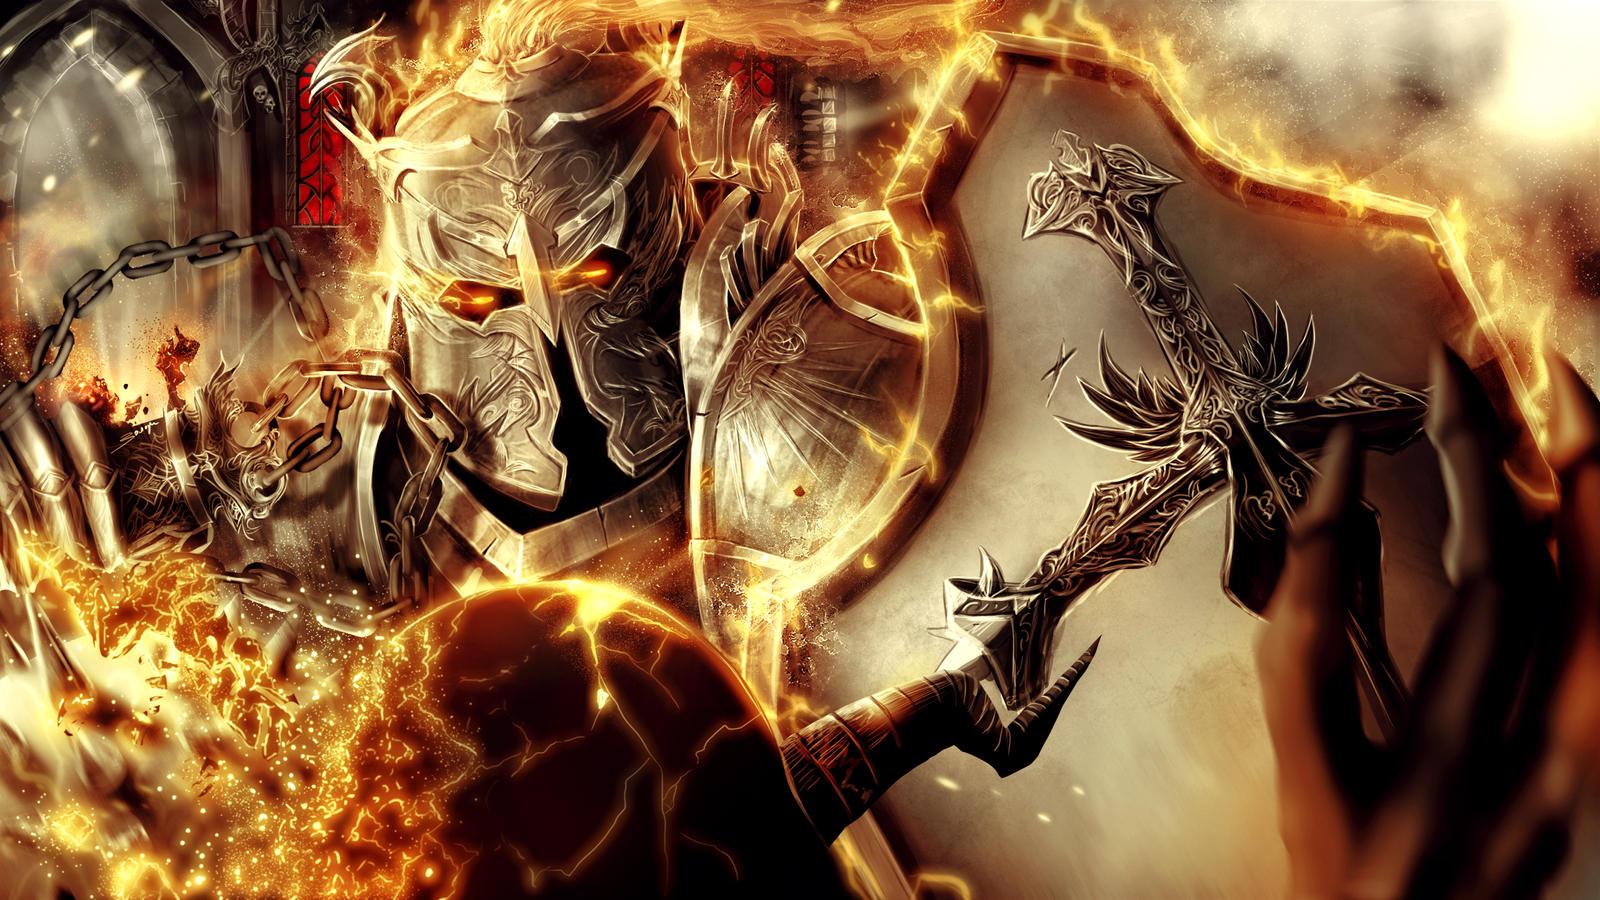 Burning Crusader by ArisT0te